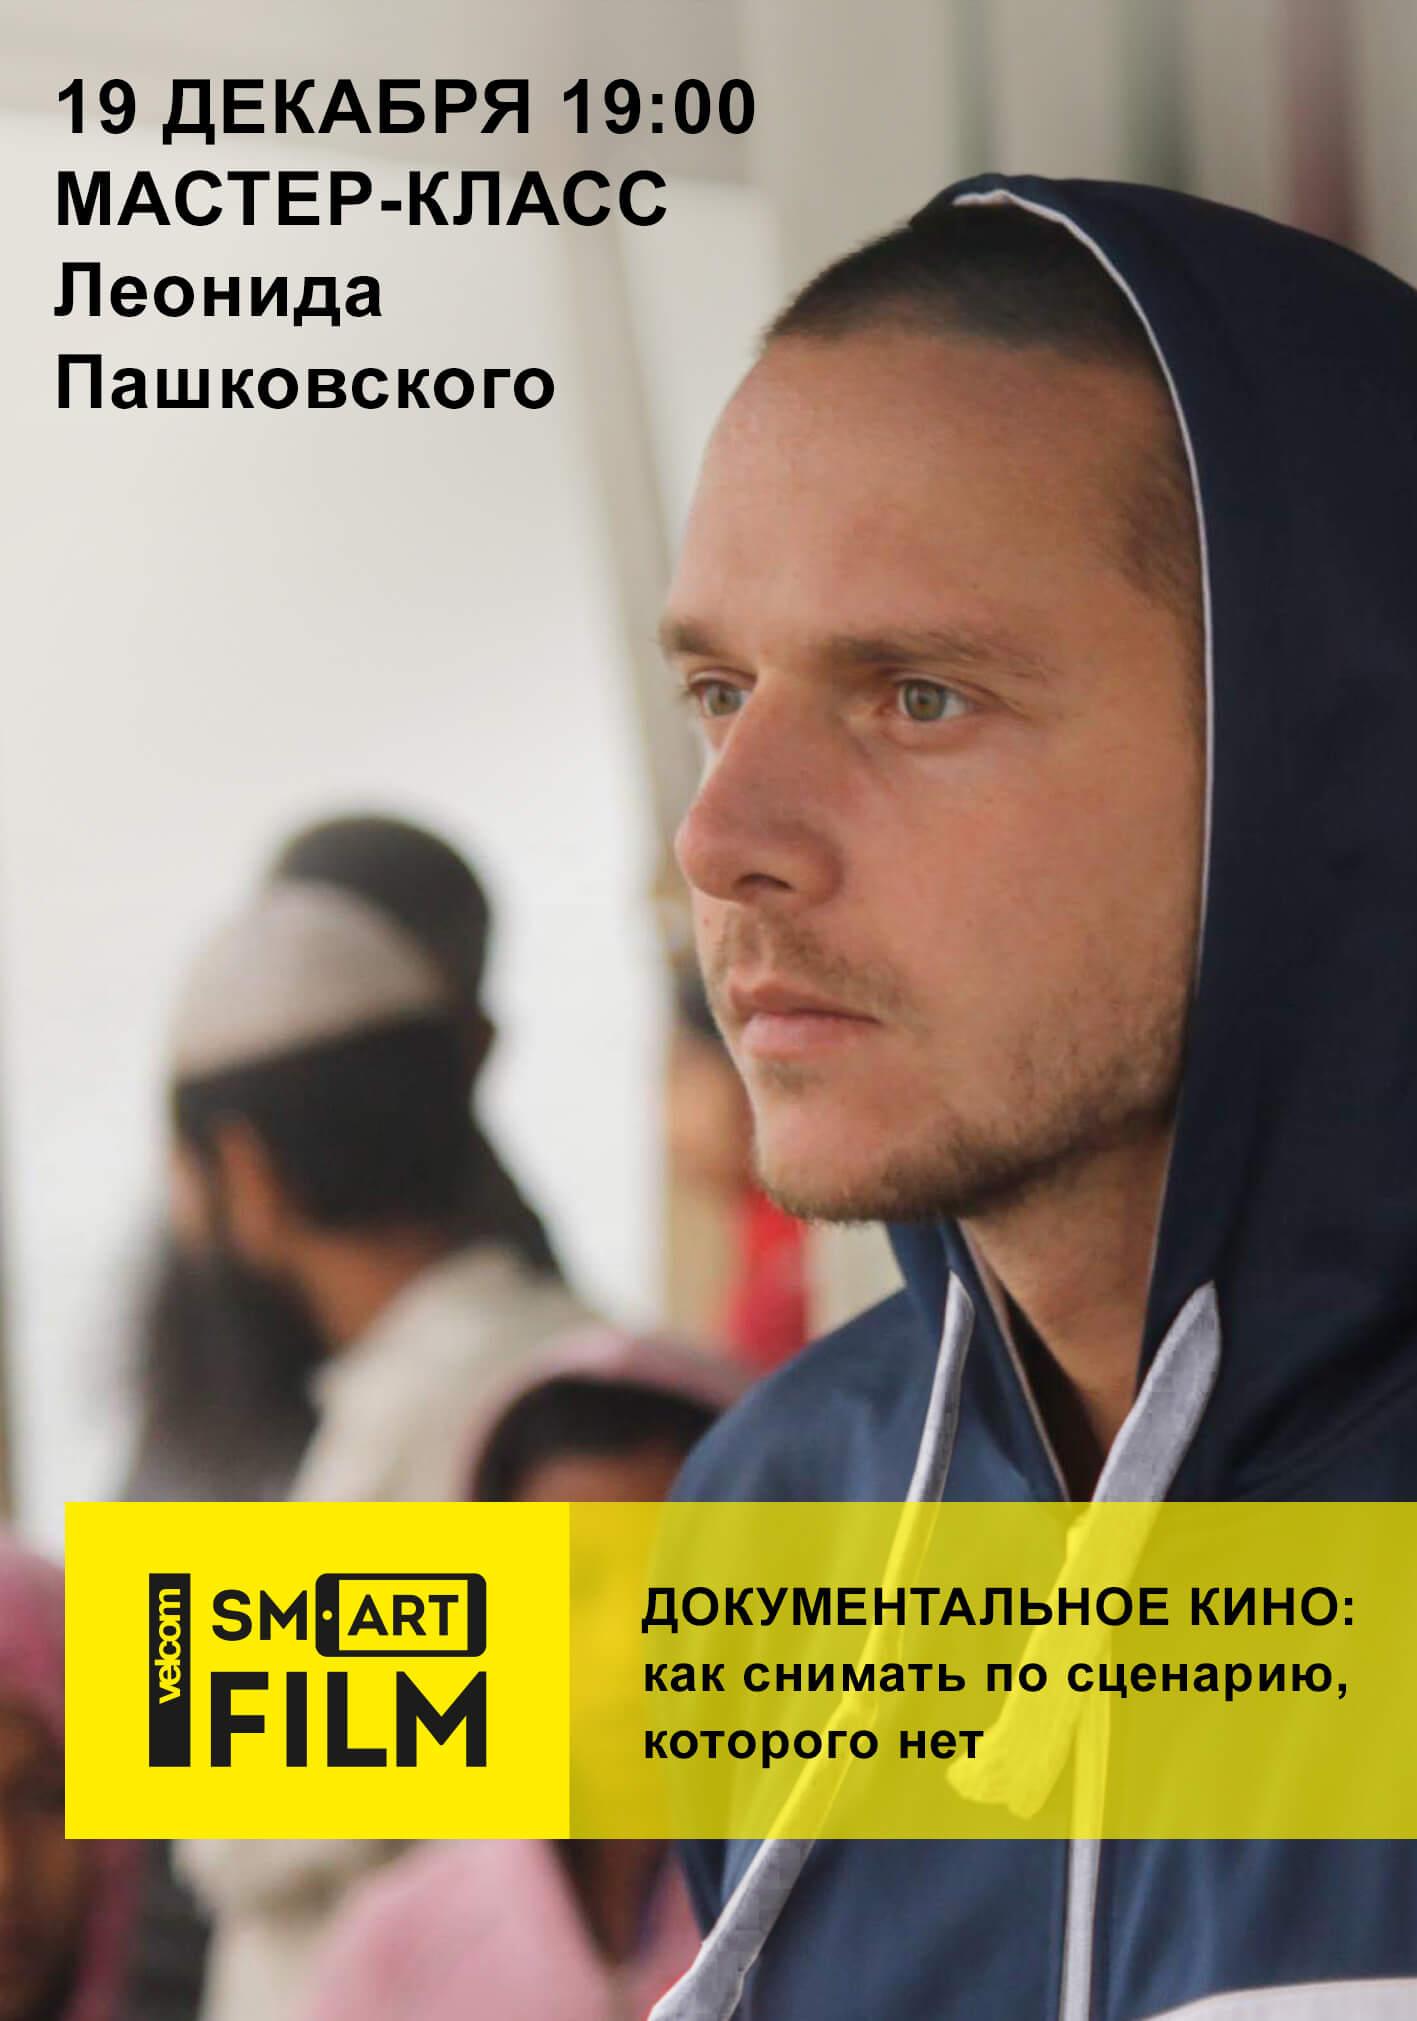 мастер-класс Леонида Пашковского